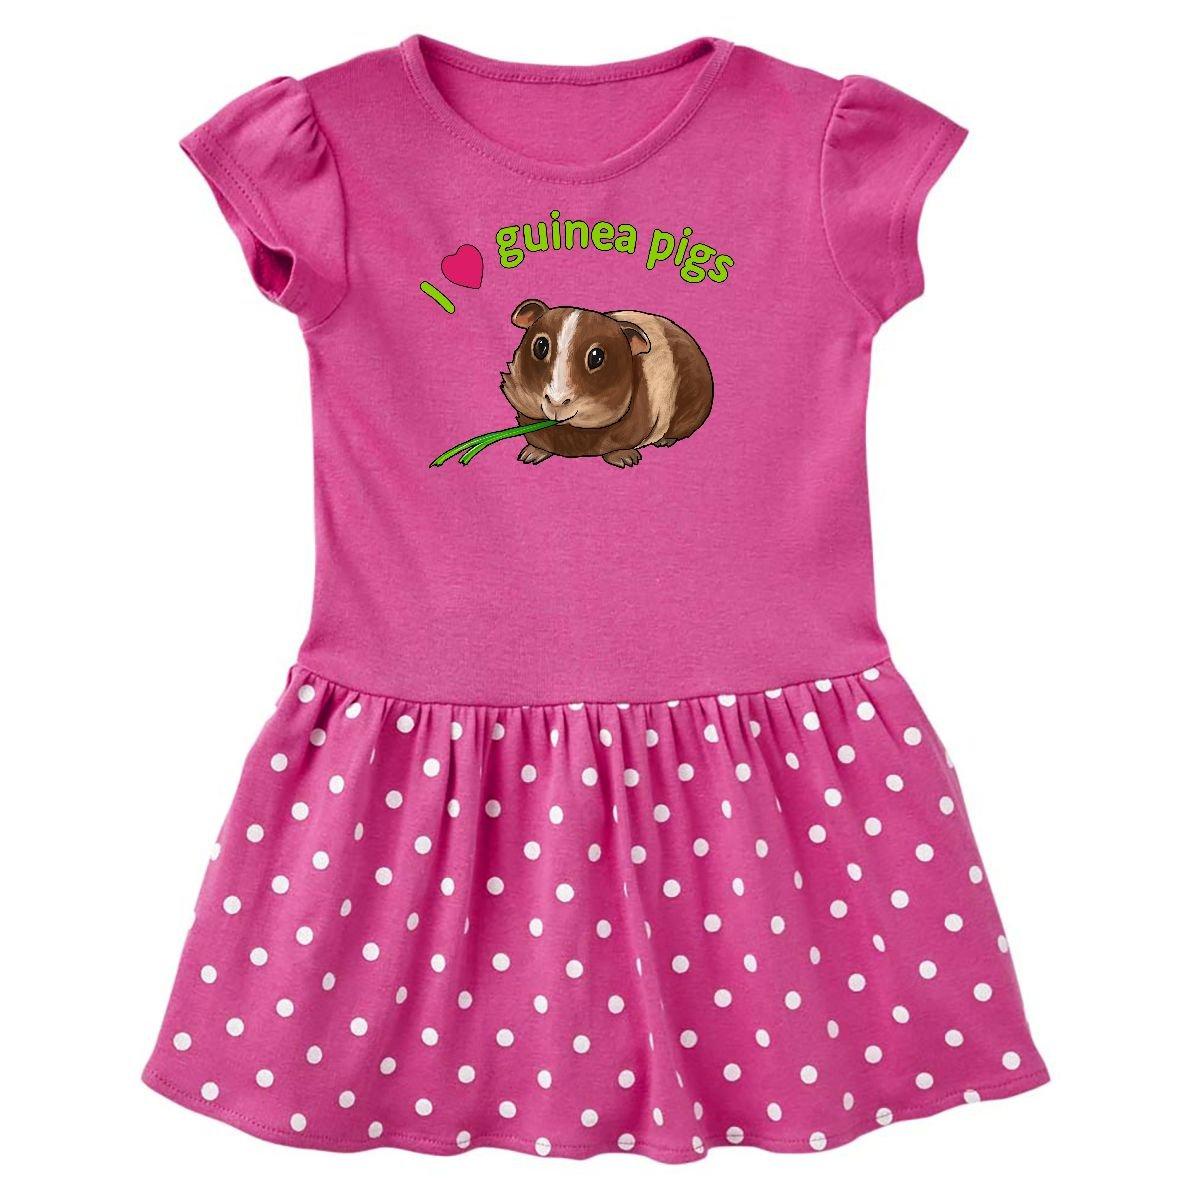 inktastic - I Love Guinea Pigs Toddler Dress 14-167769-198